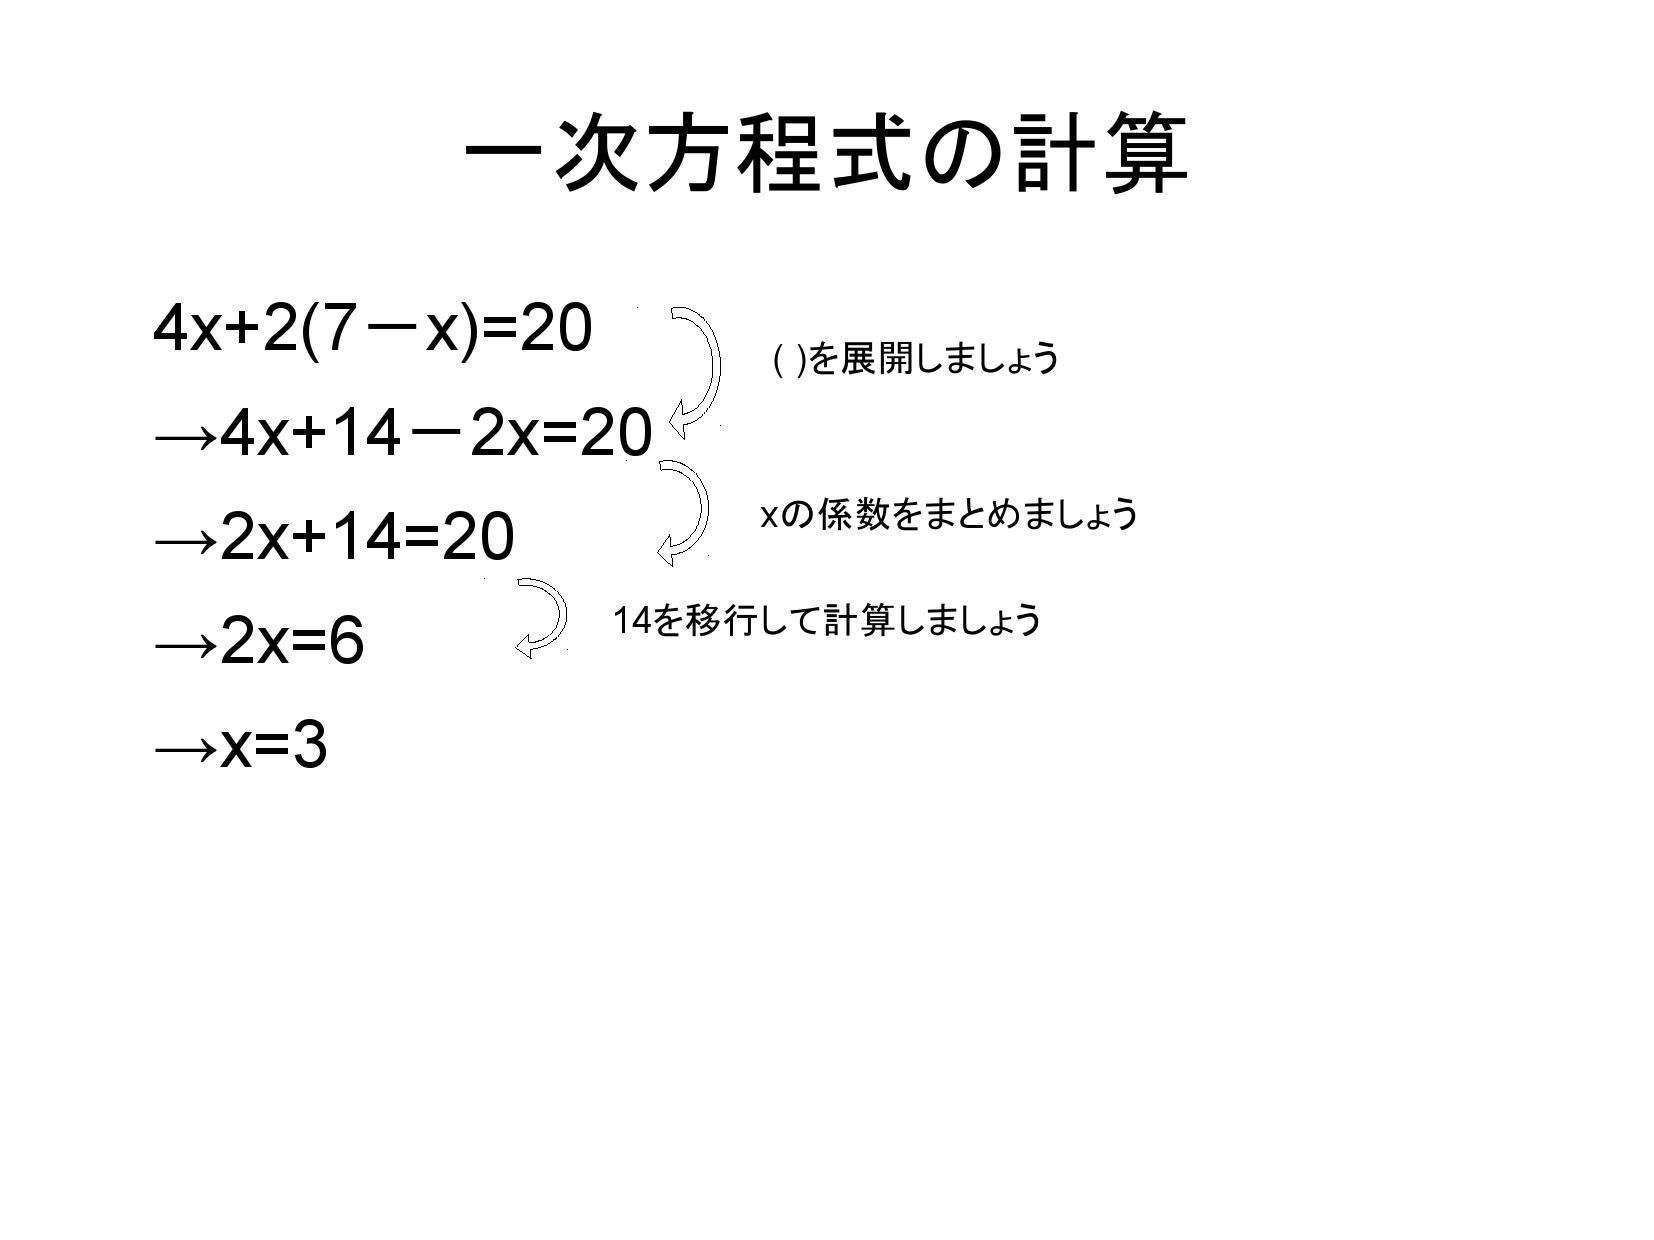 4x+2(7-x)=20  →4x+14-2x=20 →2x+14=20 →2x=6 →x=3